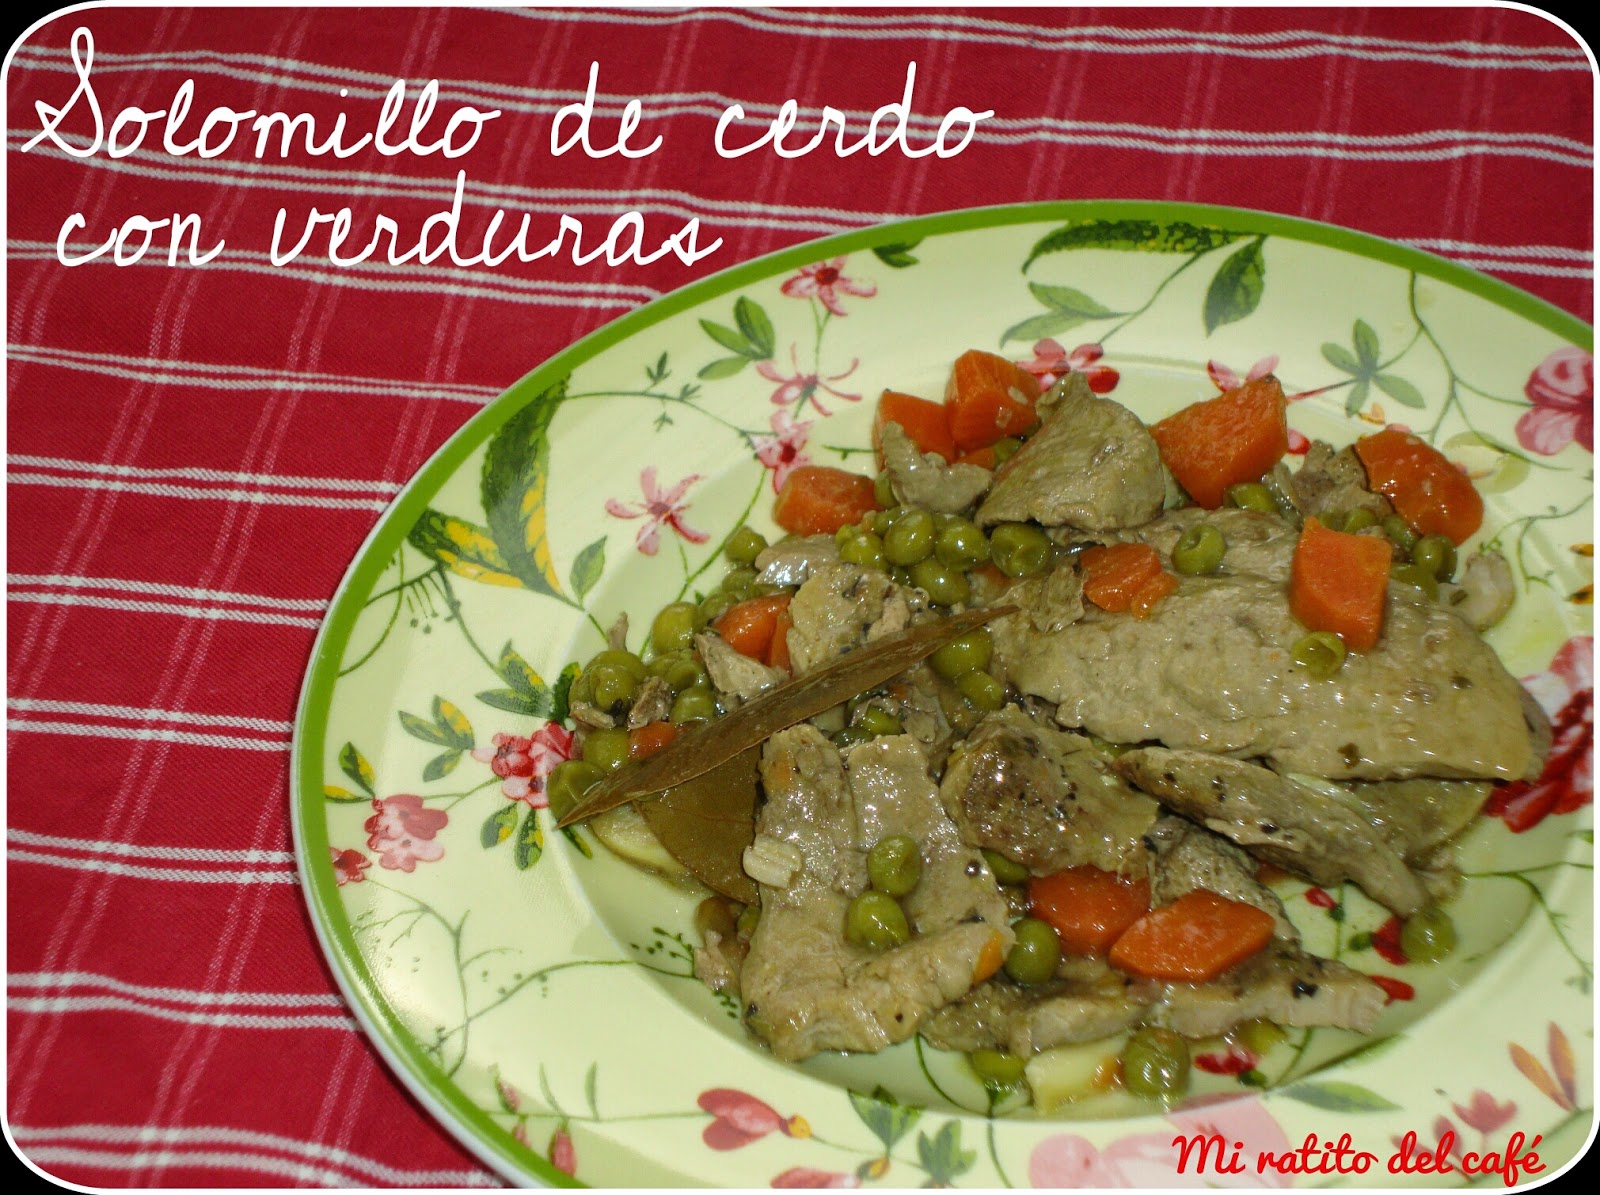 Solomillo de cerdo con verduras